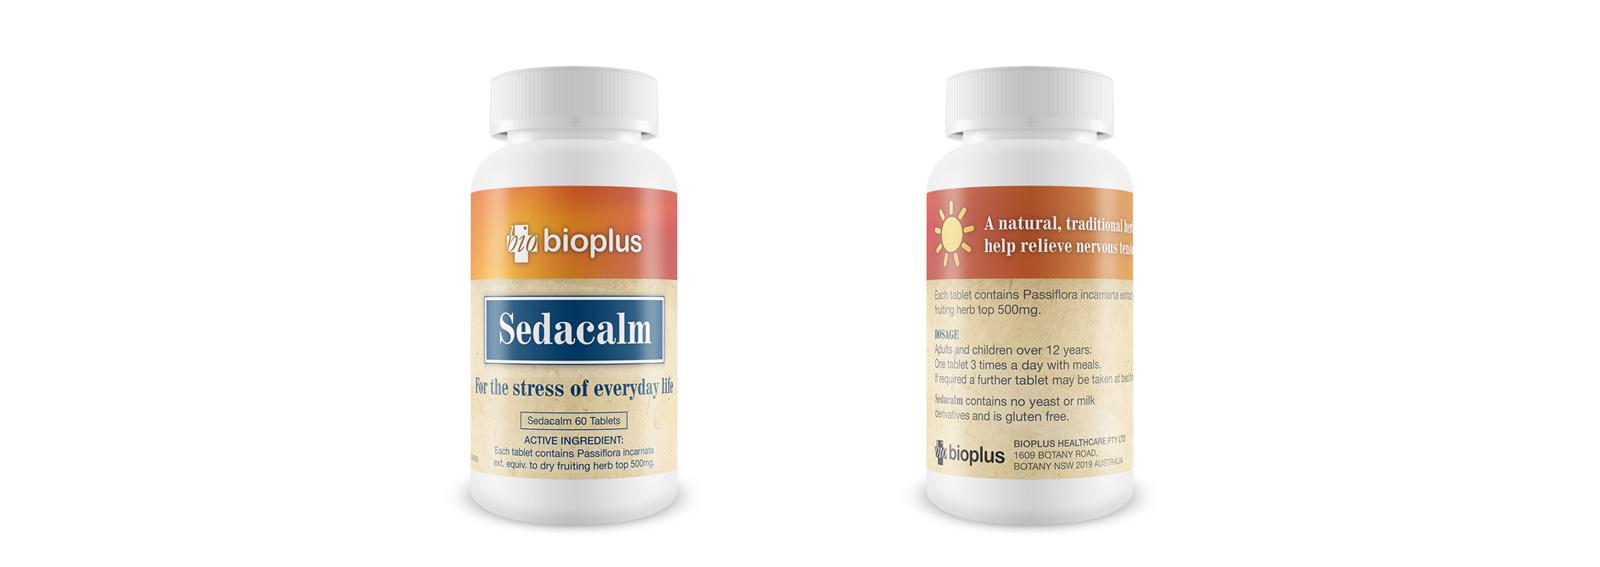 Bioplus Sedacalm Bottle Label